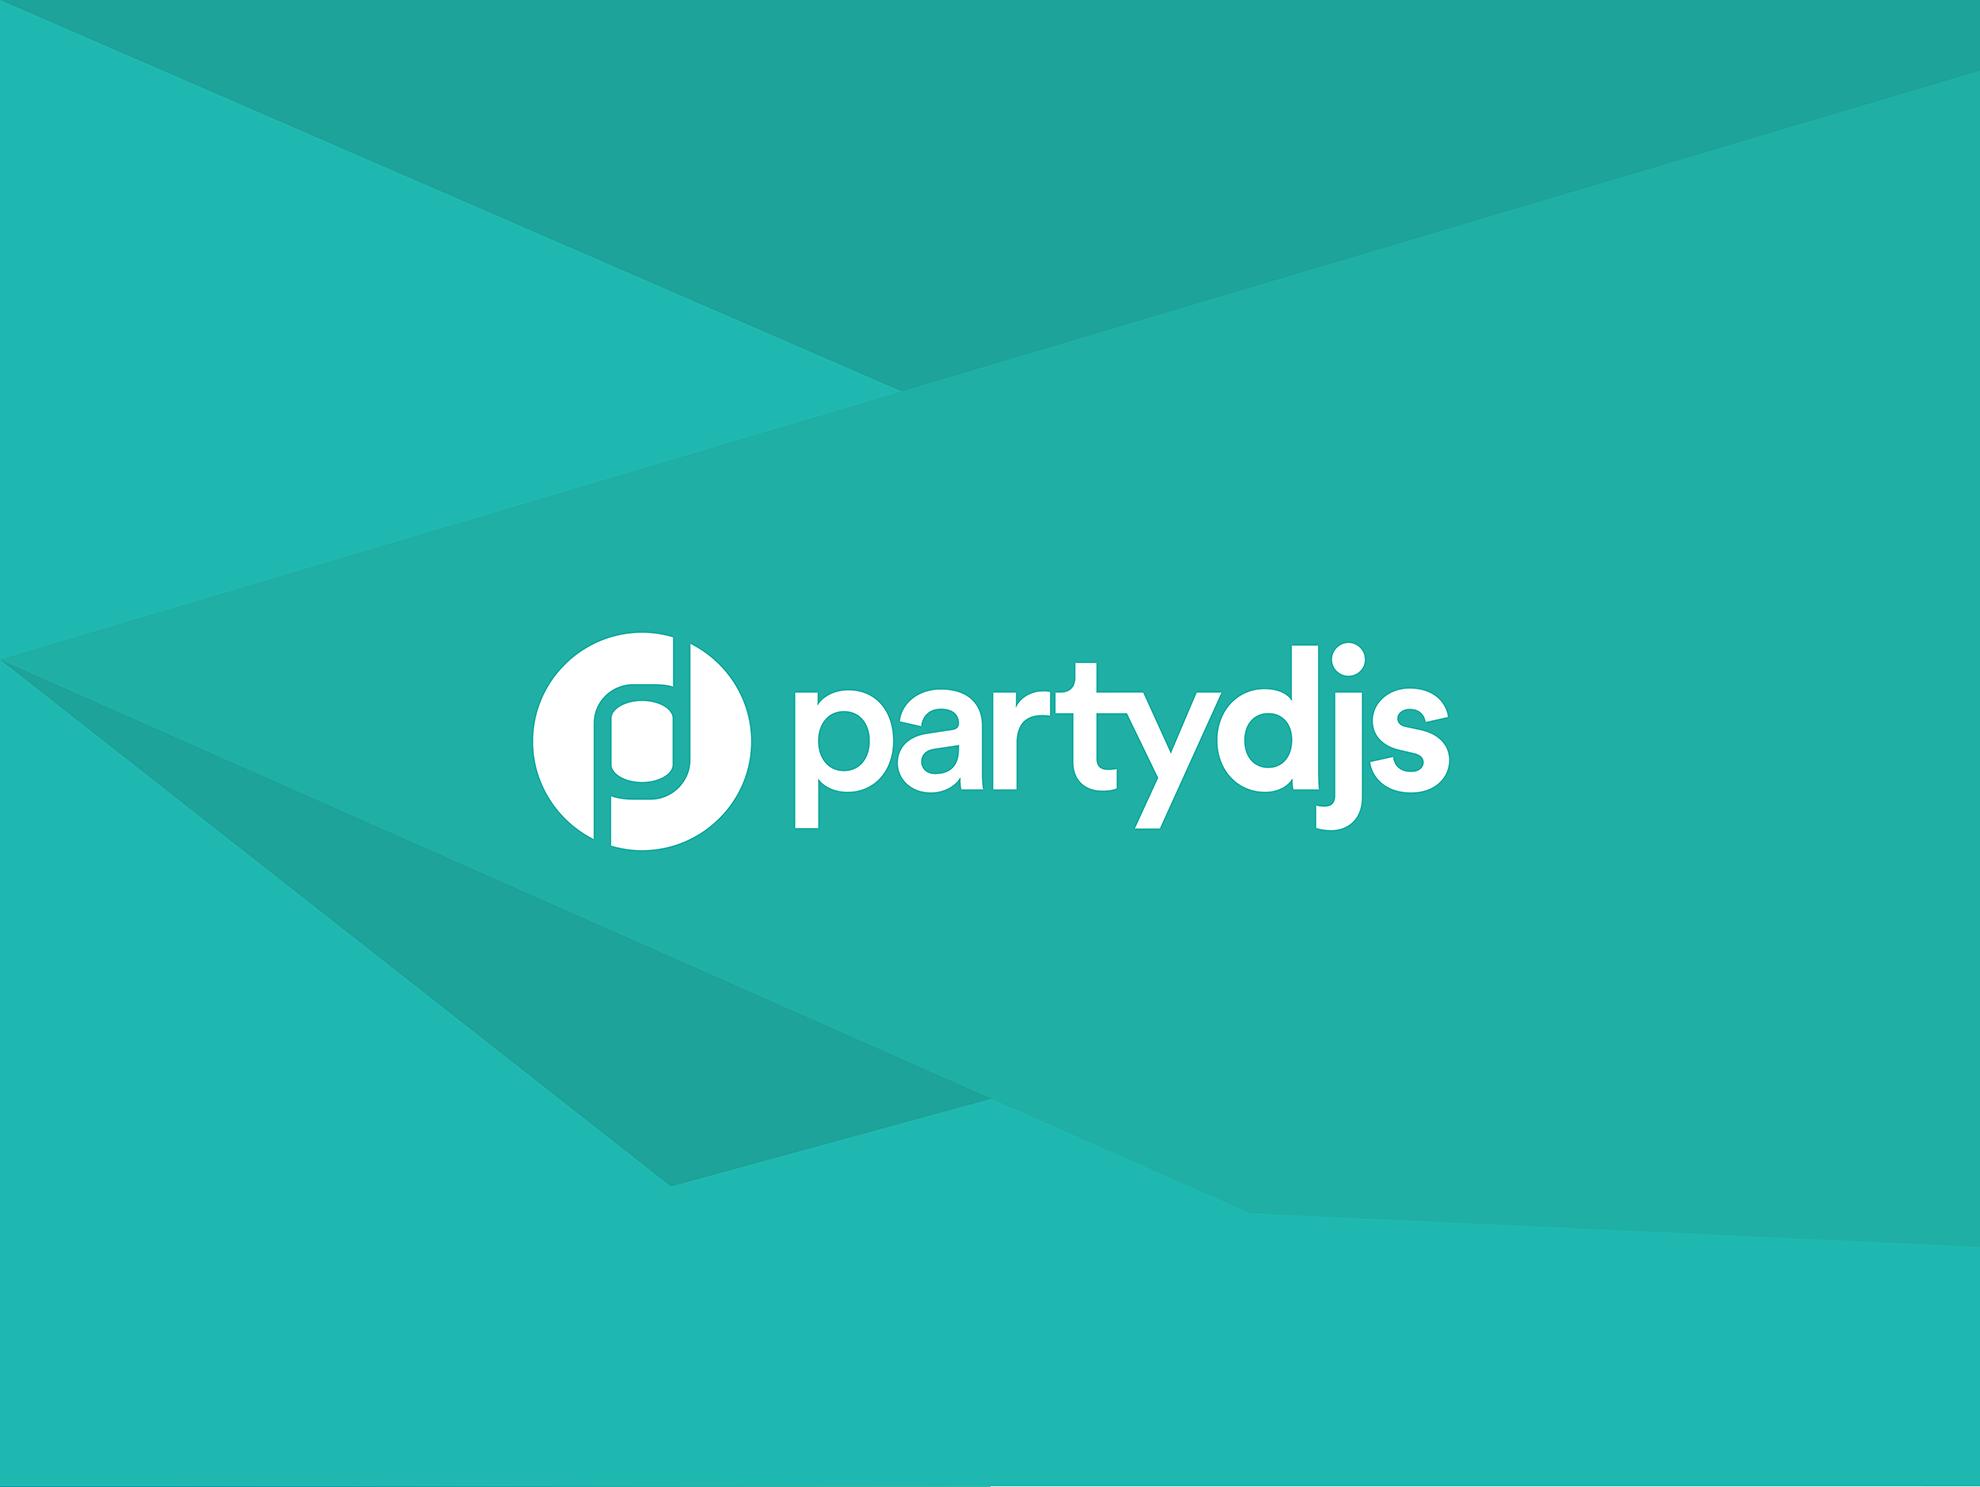 partydjs_2